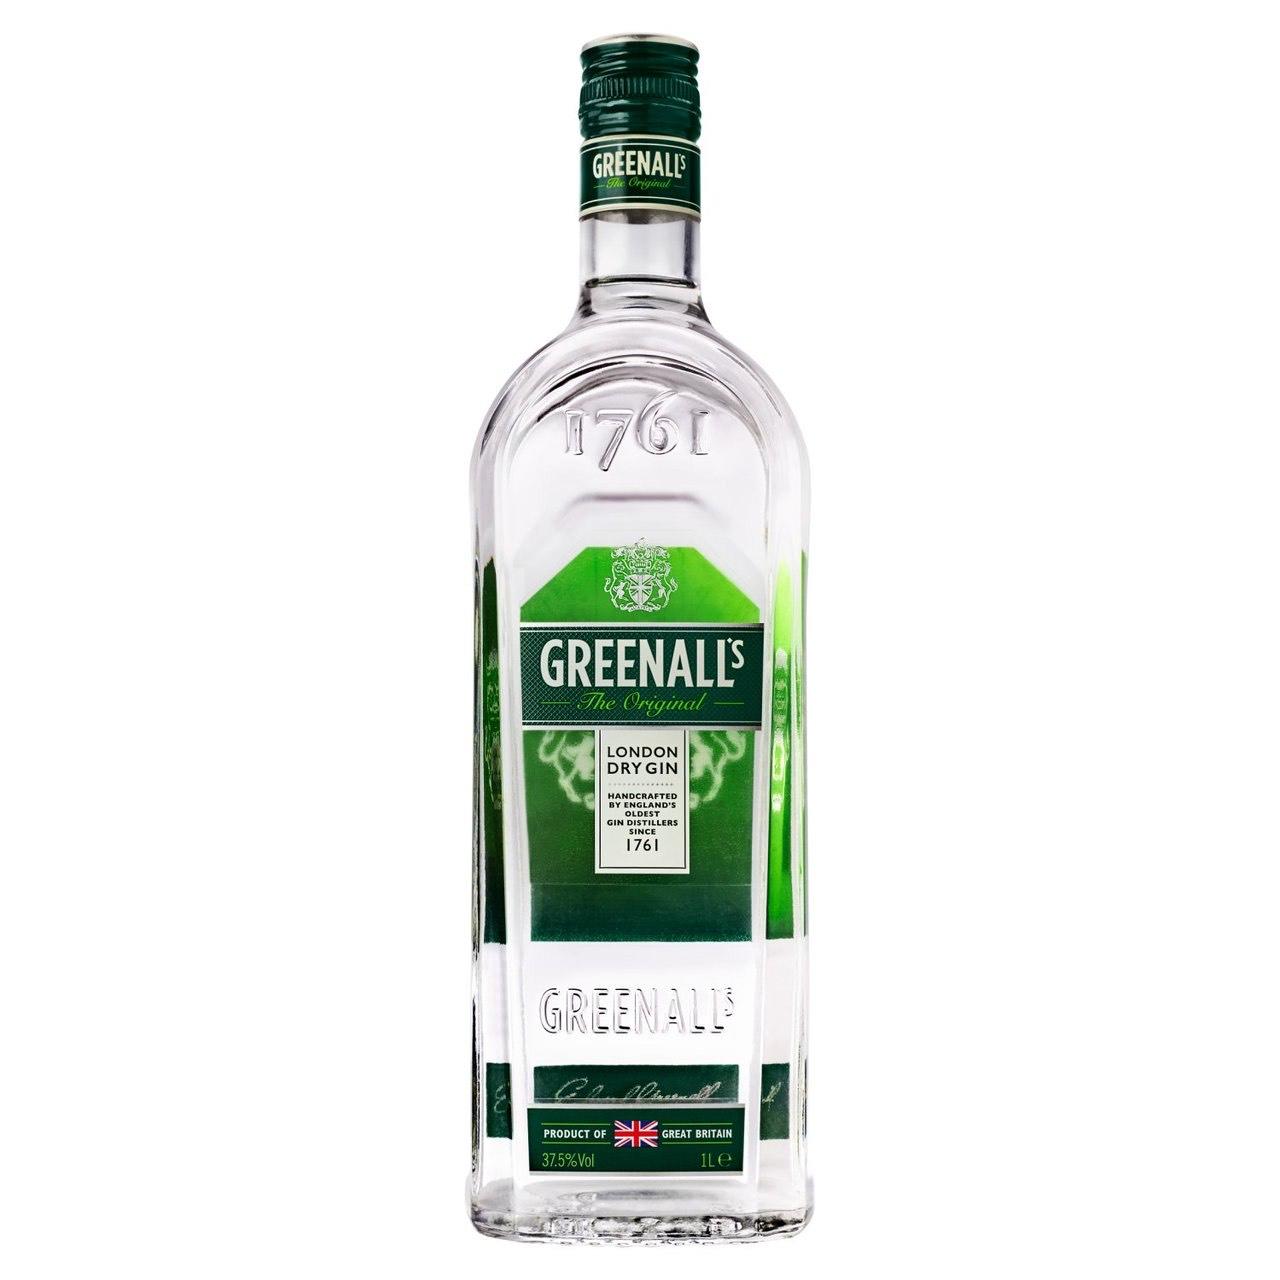 Greenall's The Original London Dry Gin 1L - £16 at Morrisons